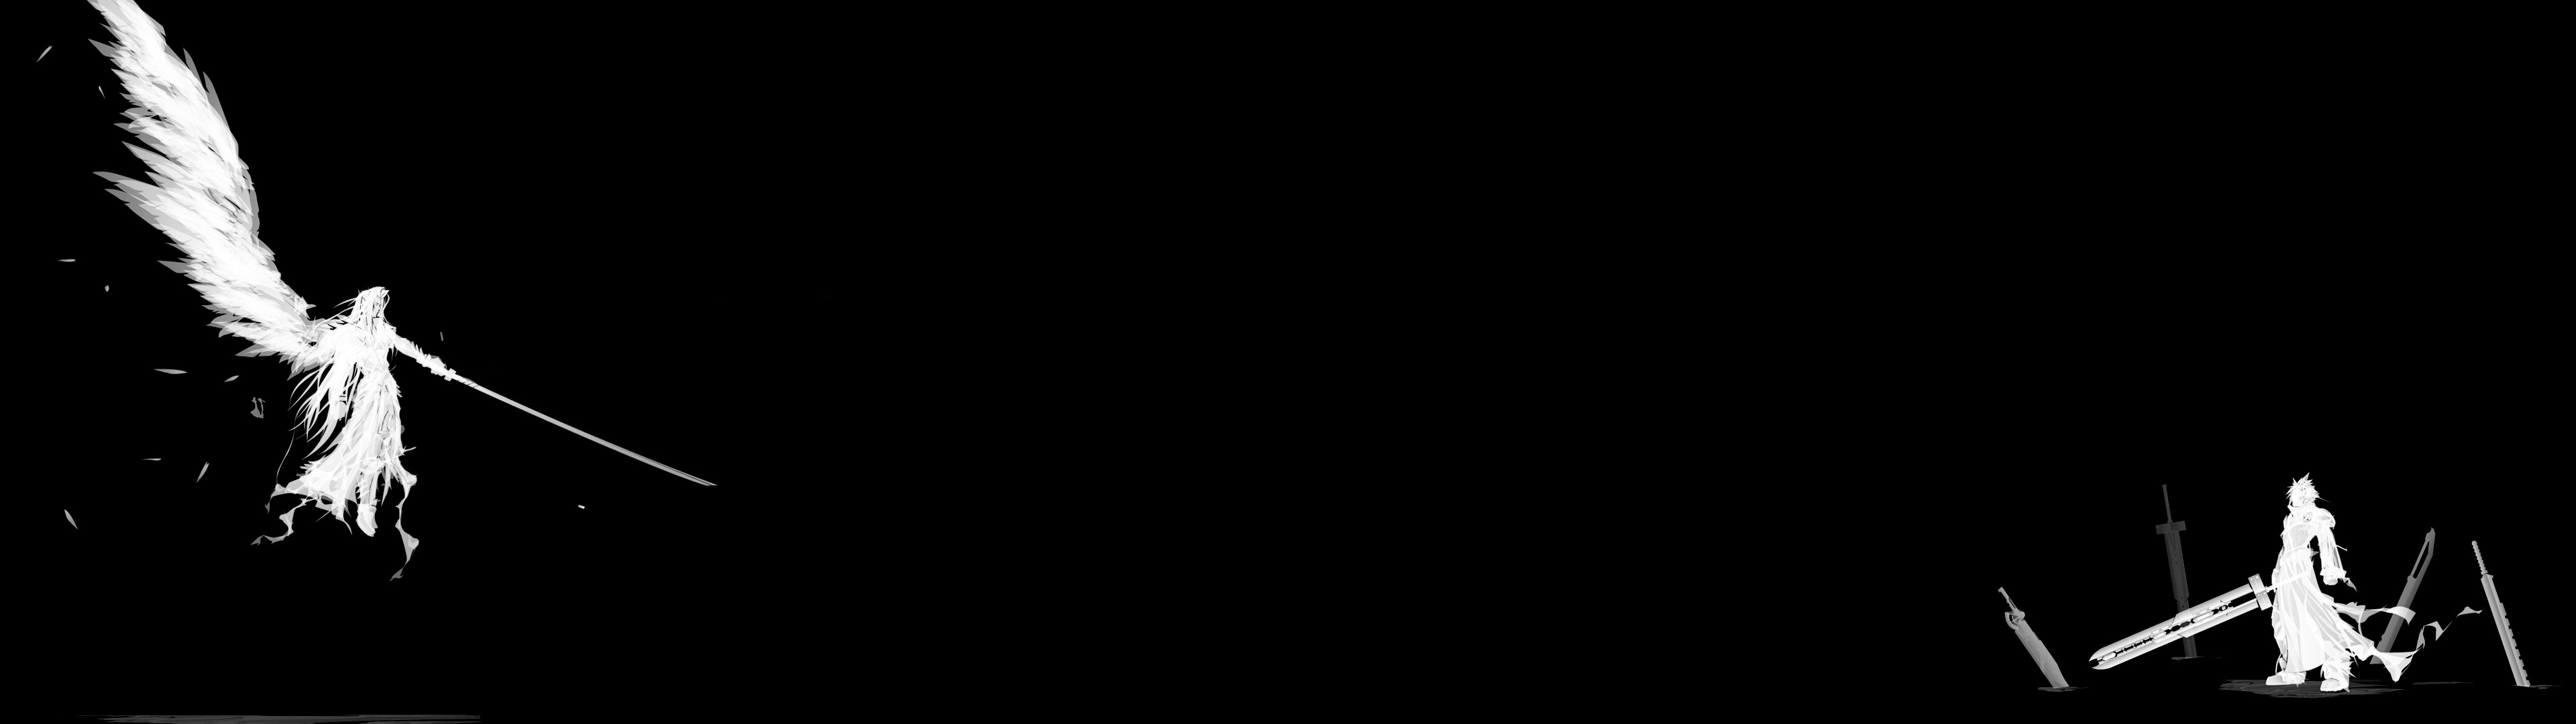 Final Fantasy Wallpaper [3840 X 1080] [Dual Screen]